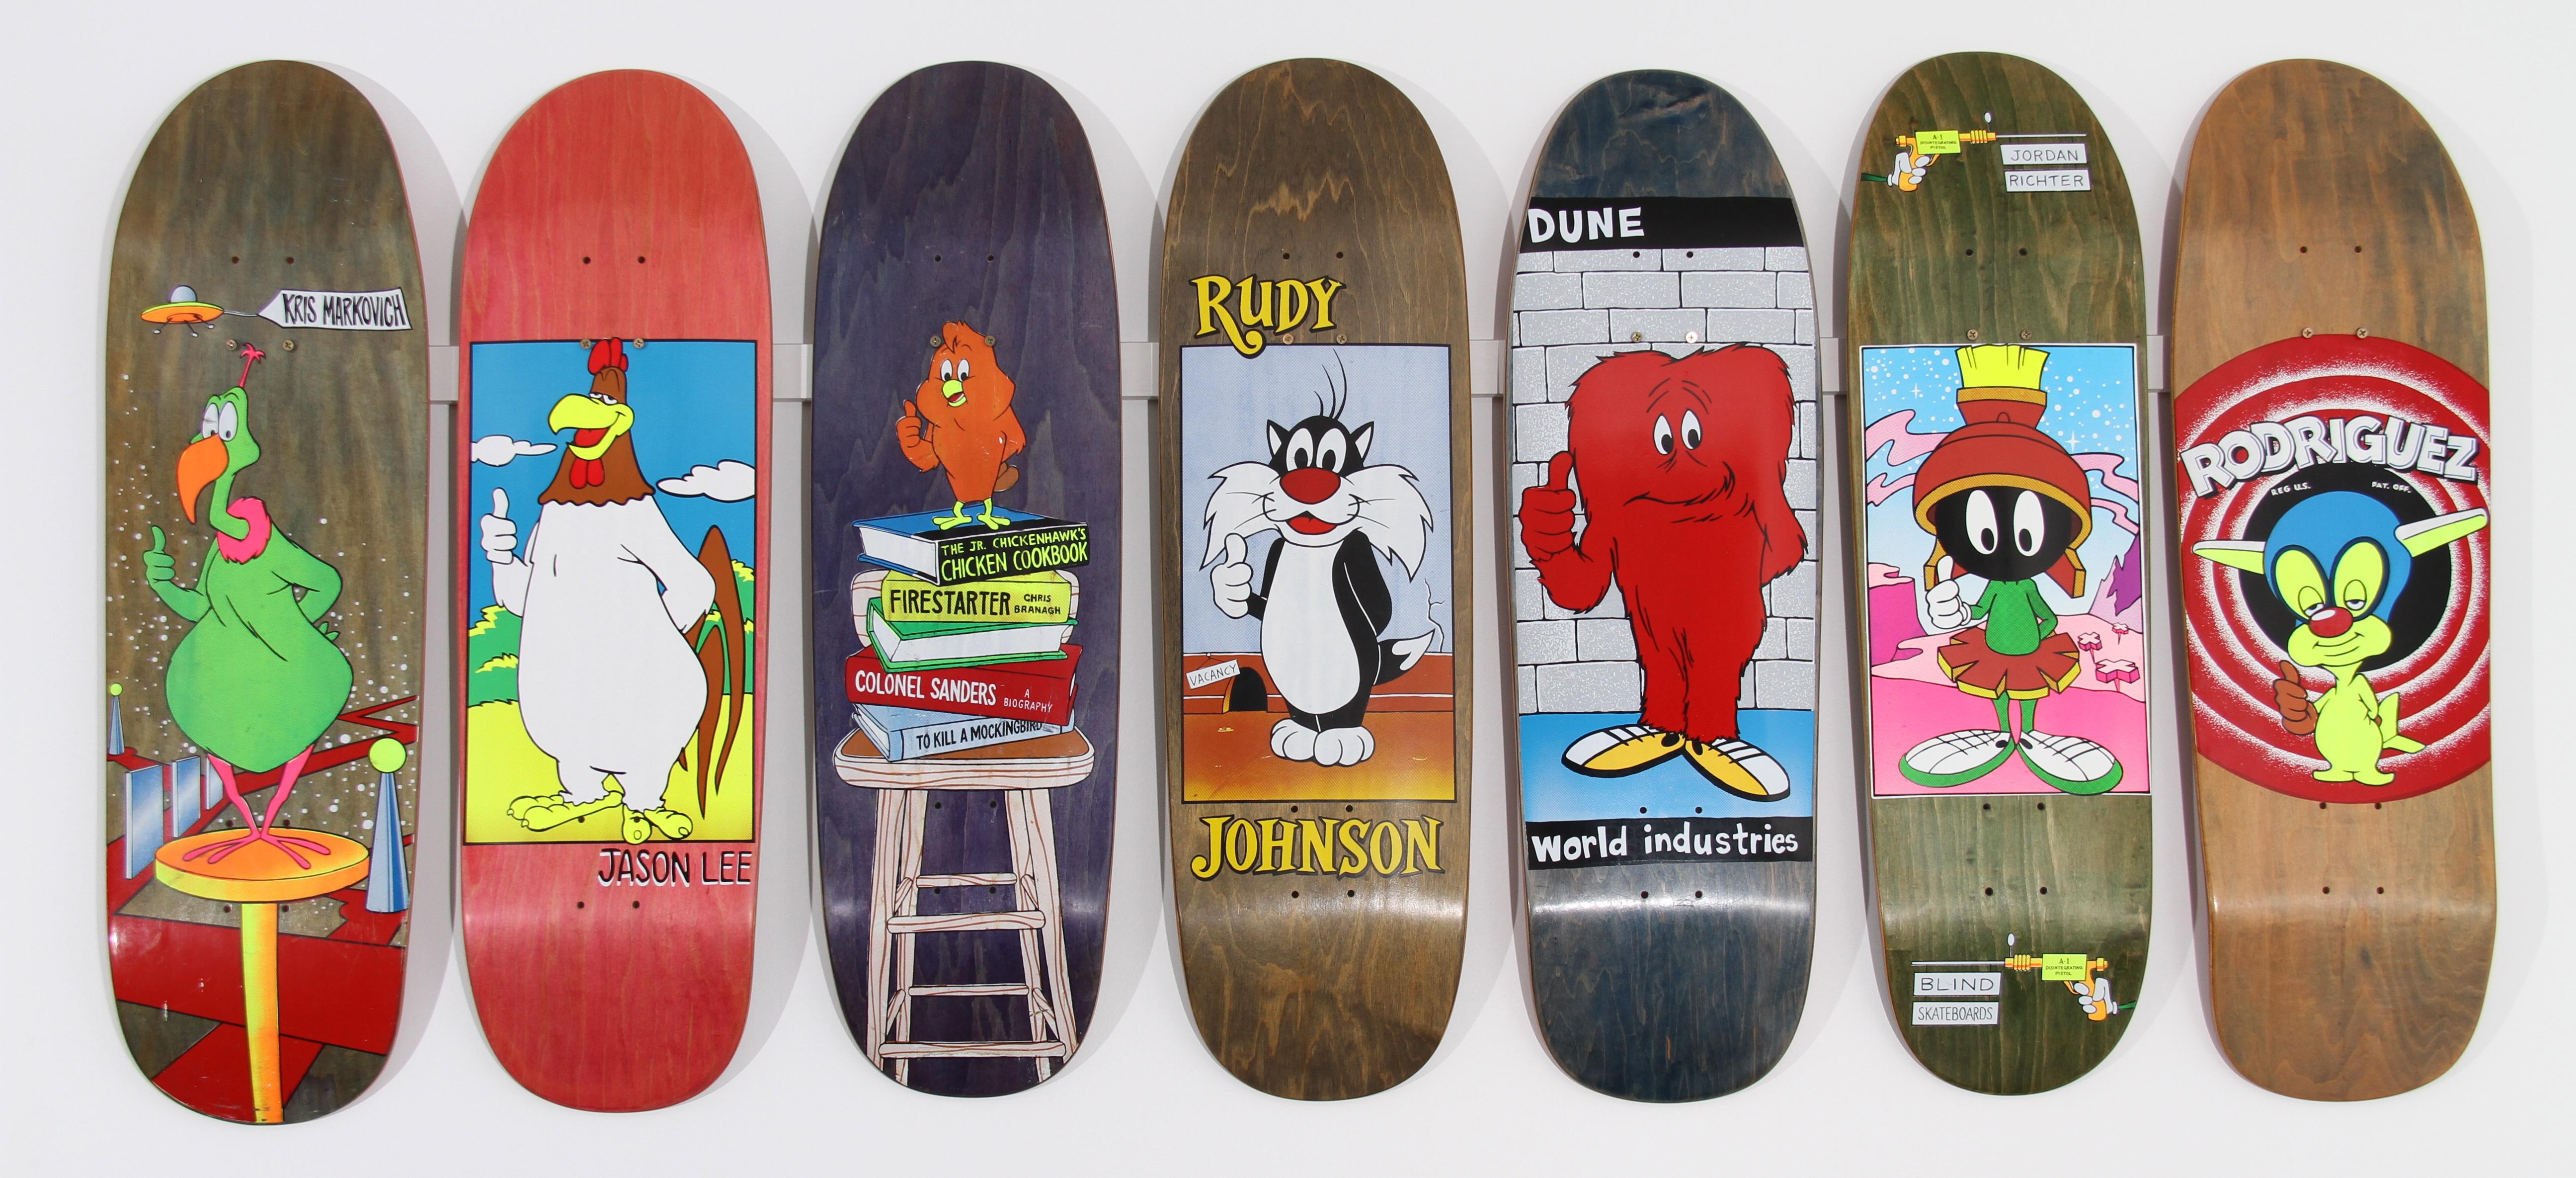 world industries - looney toons | Skateboard Art | Pinterest